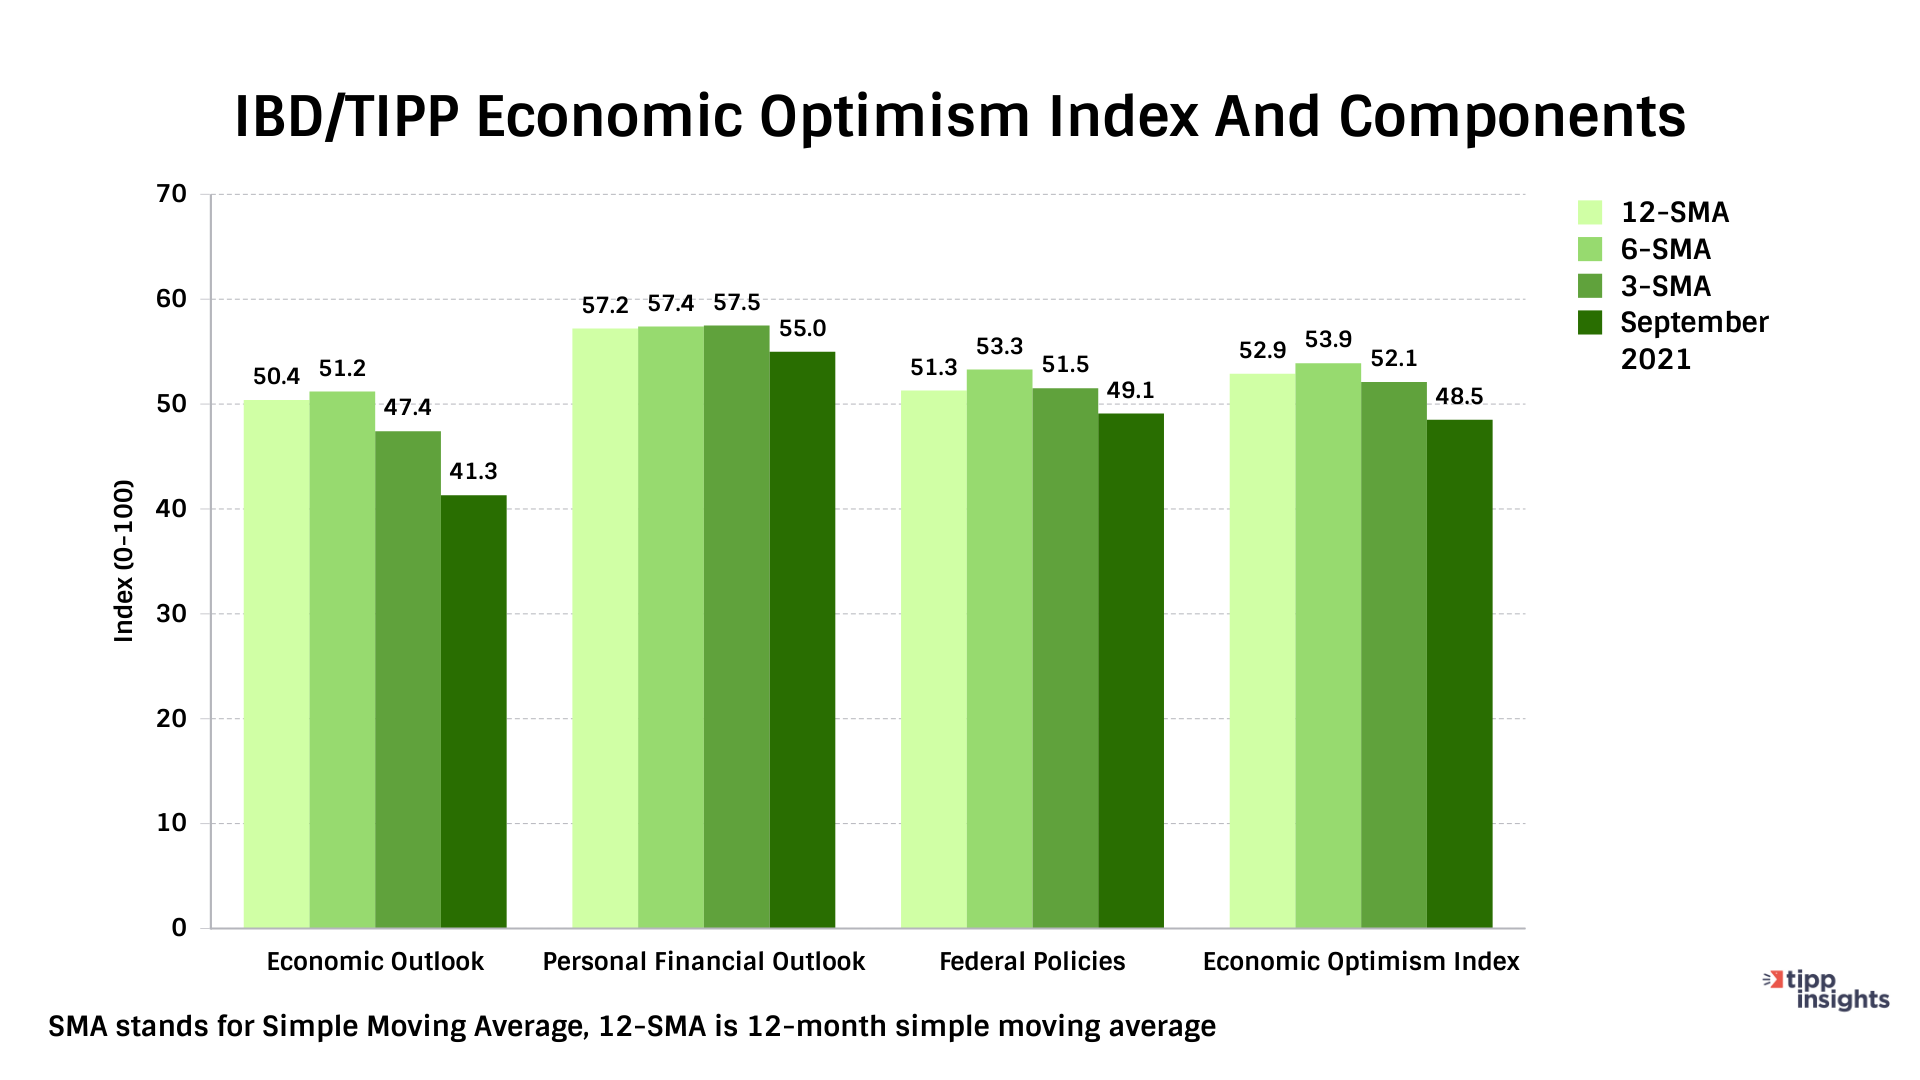 IBD/TIPP Economic Optimism Index and components Momentum